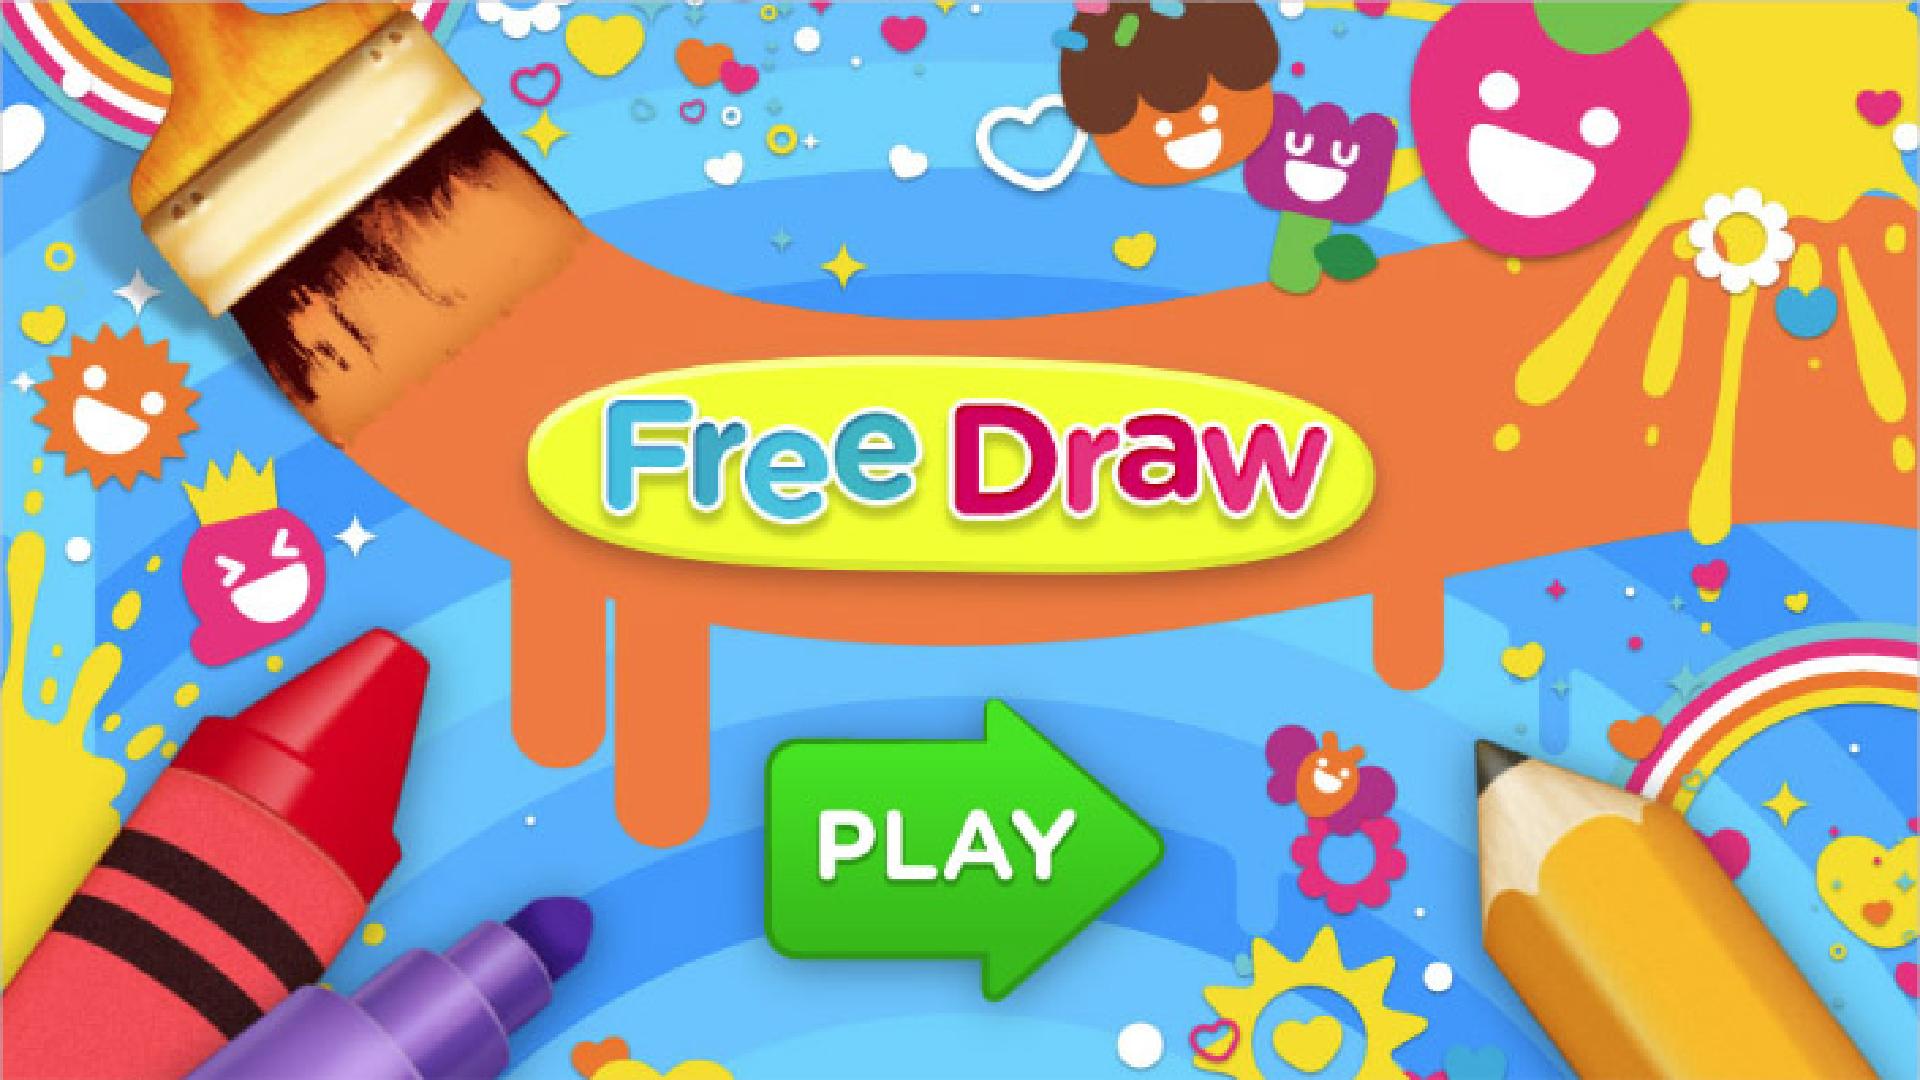 projectbanner_Nick_Free_Draw_1920_1080_01